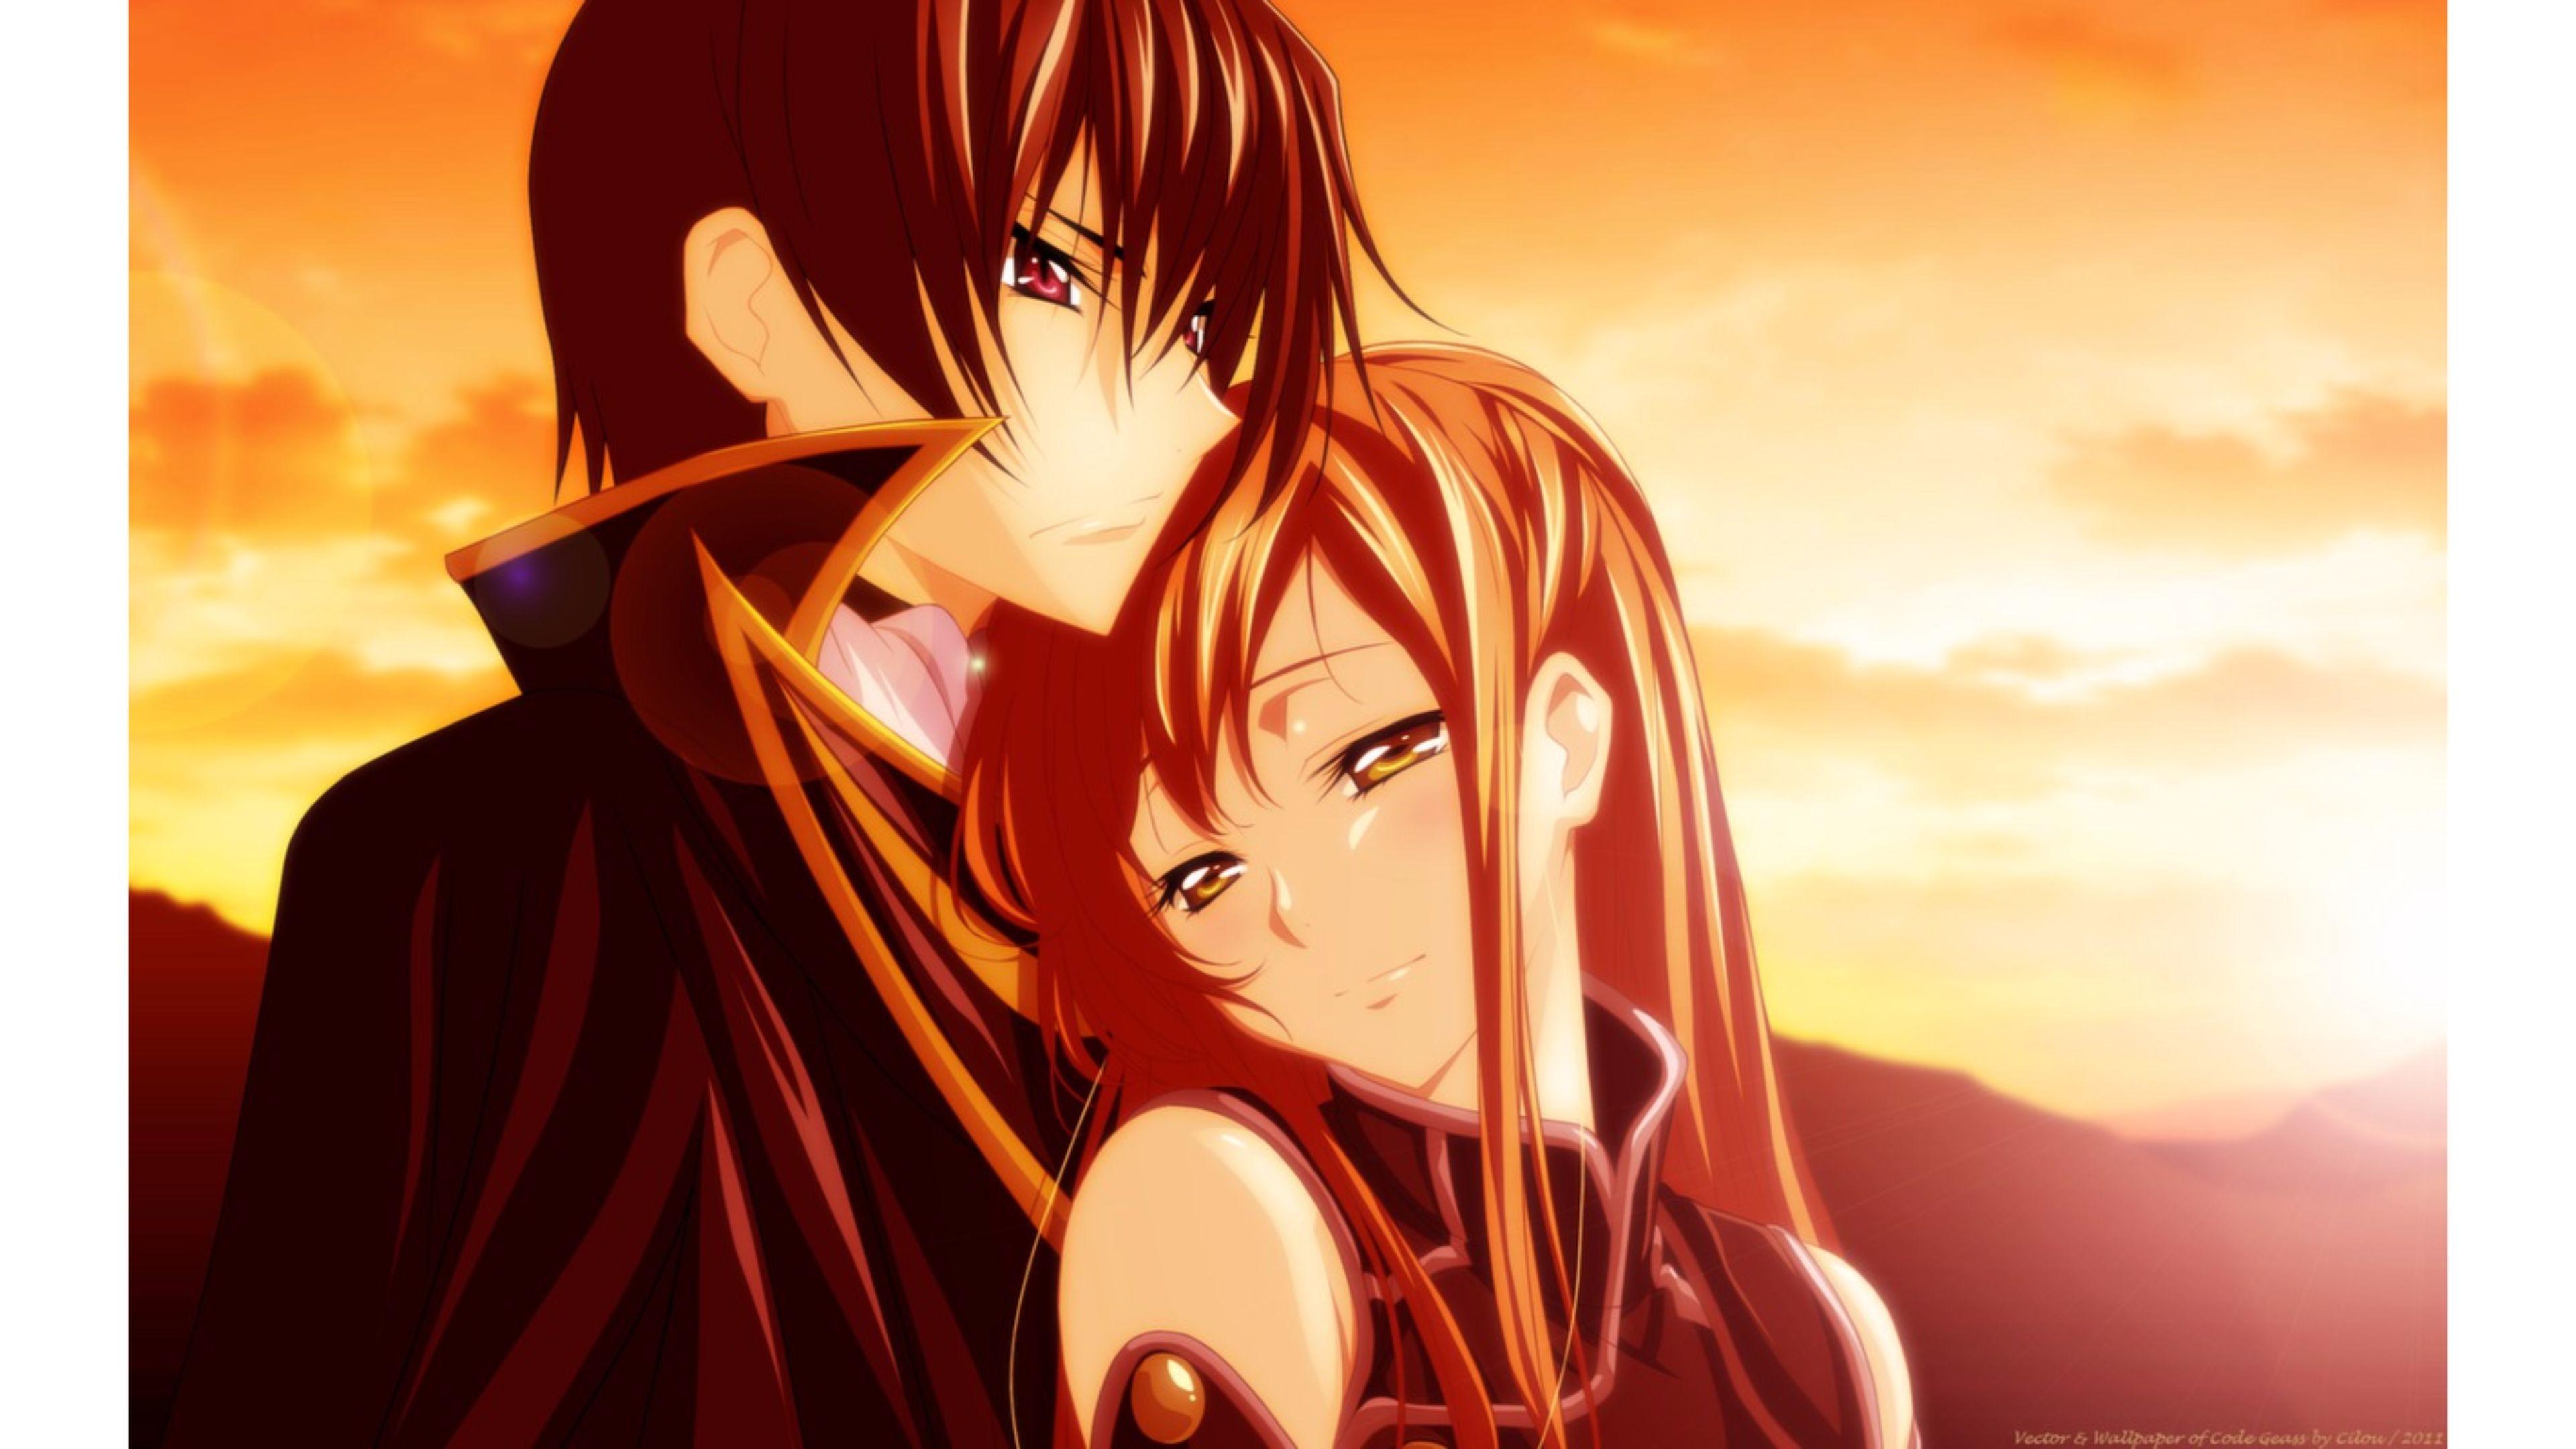 3d Couple Kissing Wallpapers Anime Love Wallpaper 183 ①